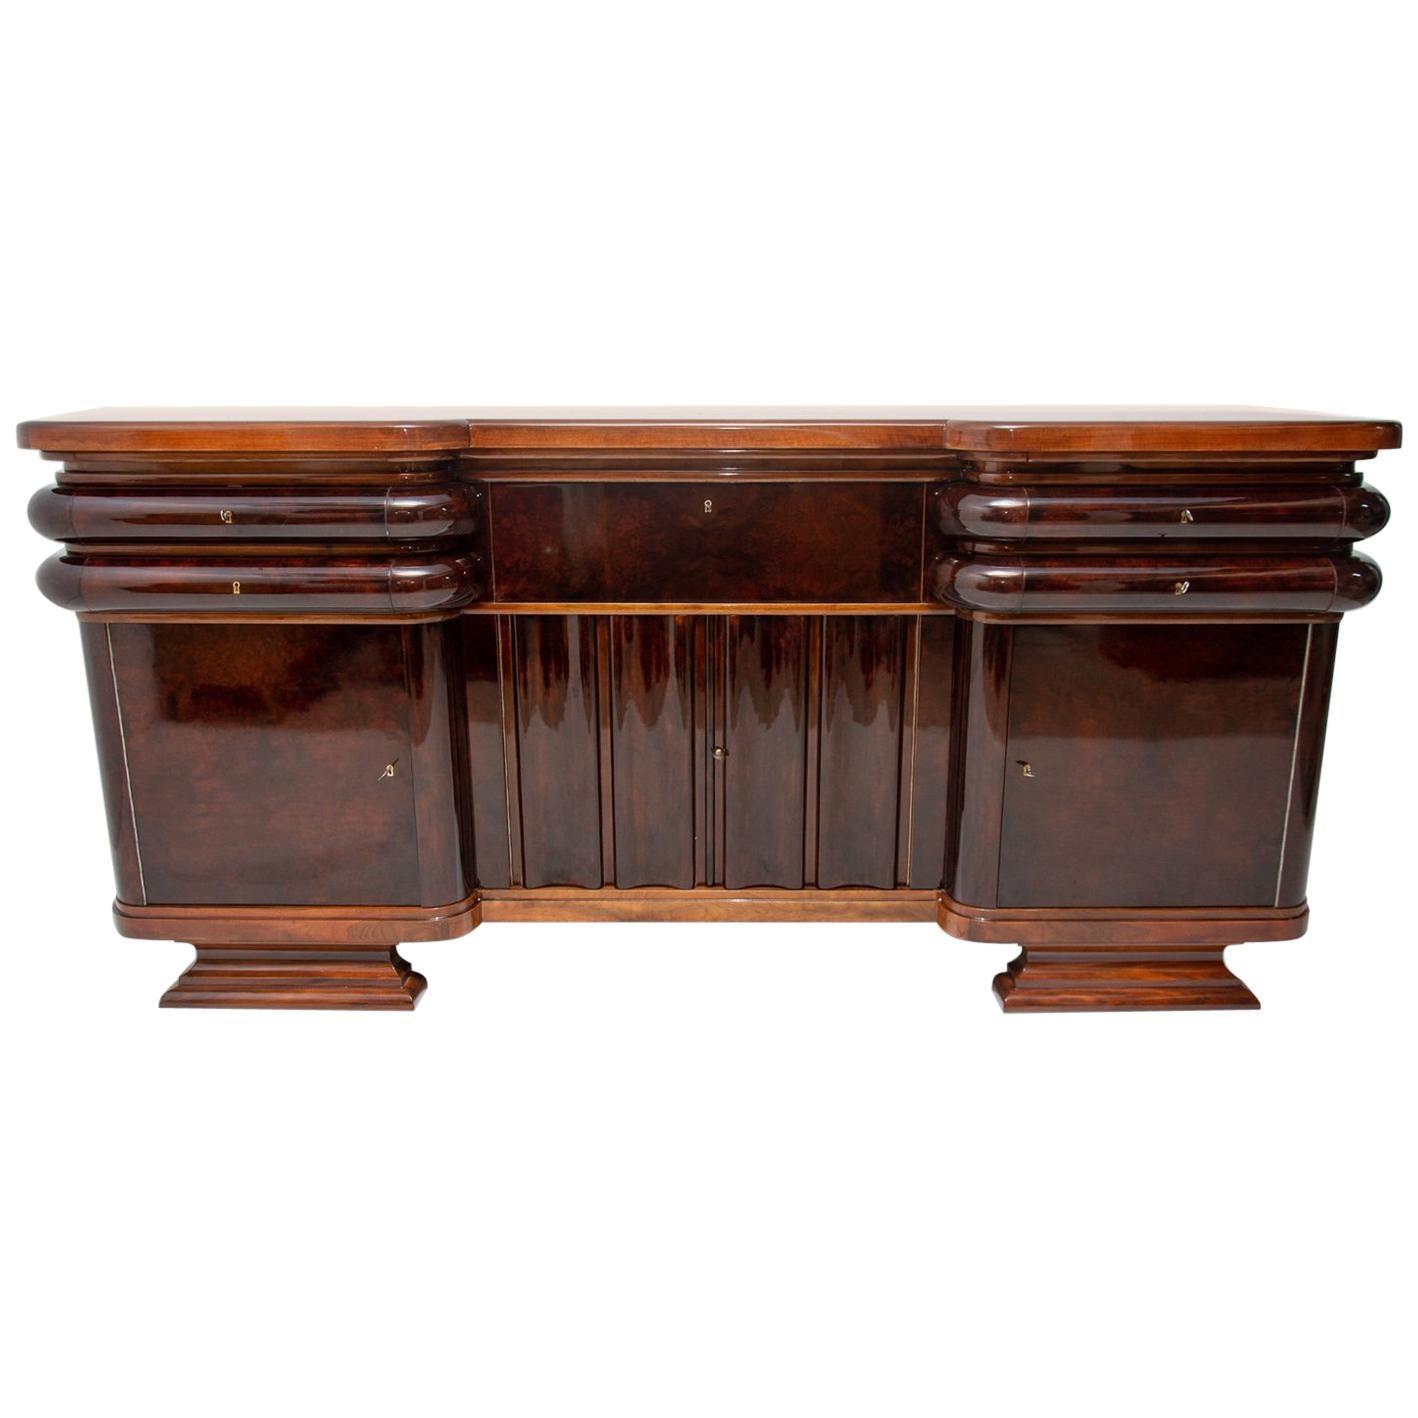 French Art Deco Style Walnut Sideboard or Buffet, 1930s, Bohemia